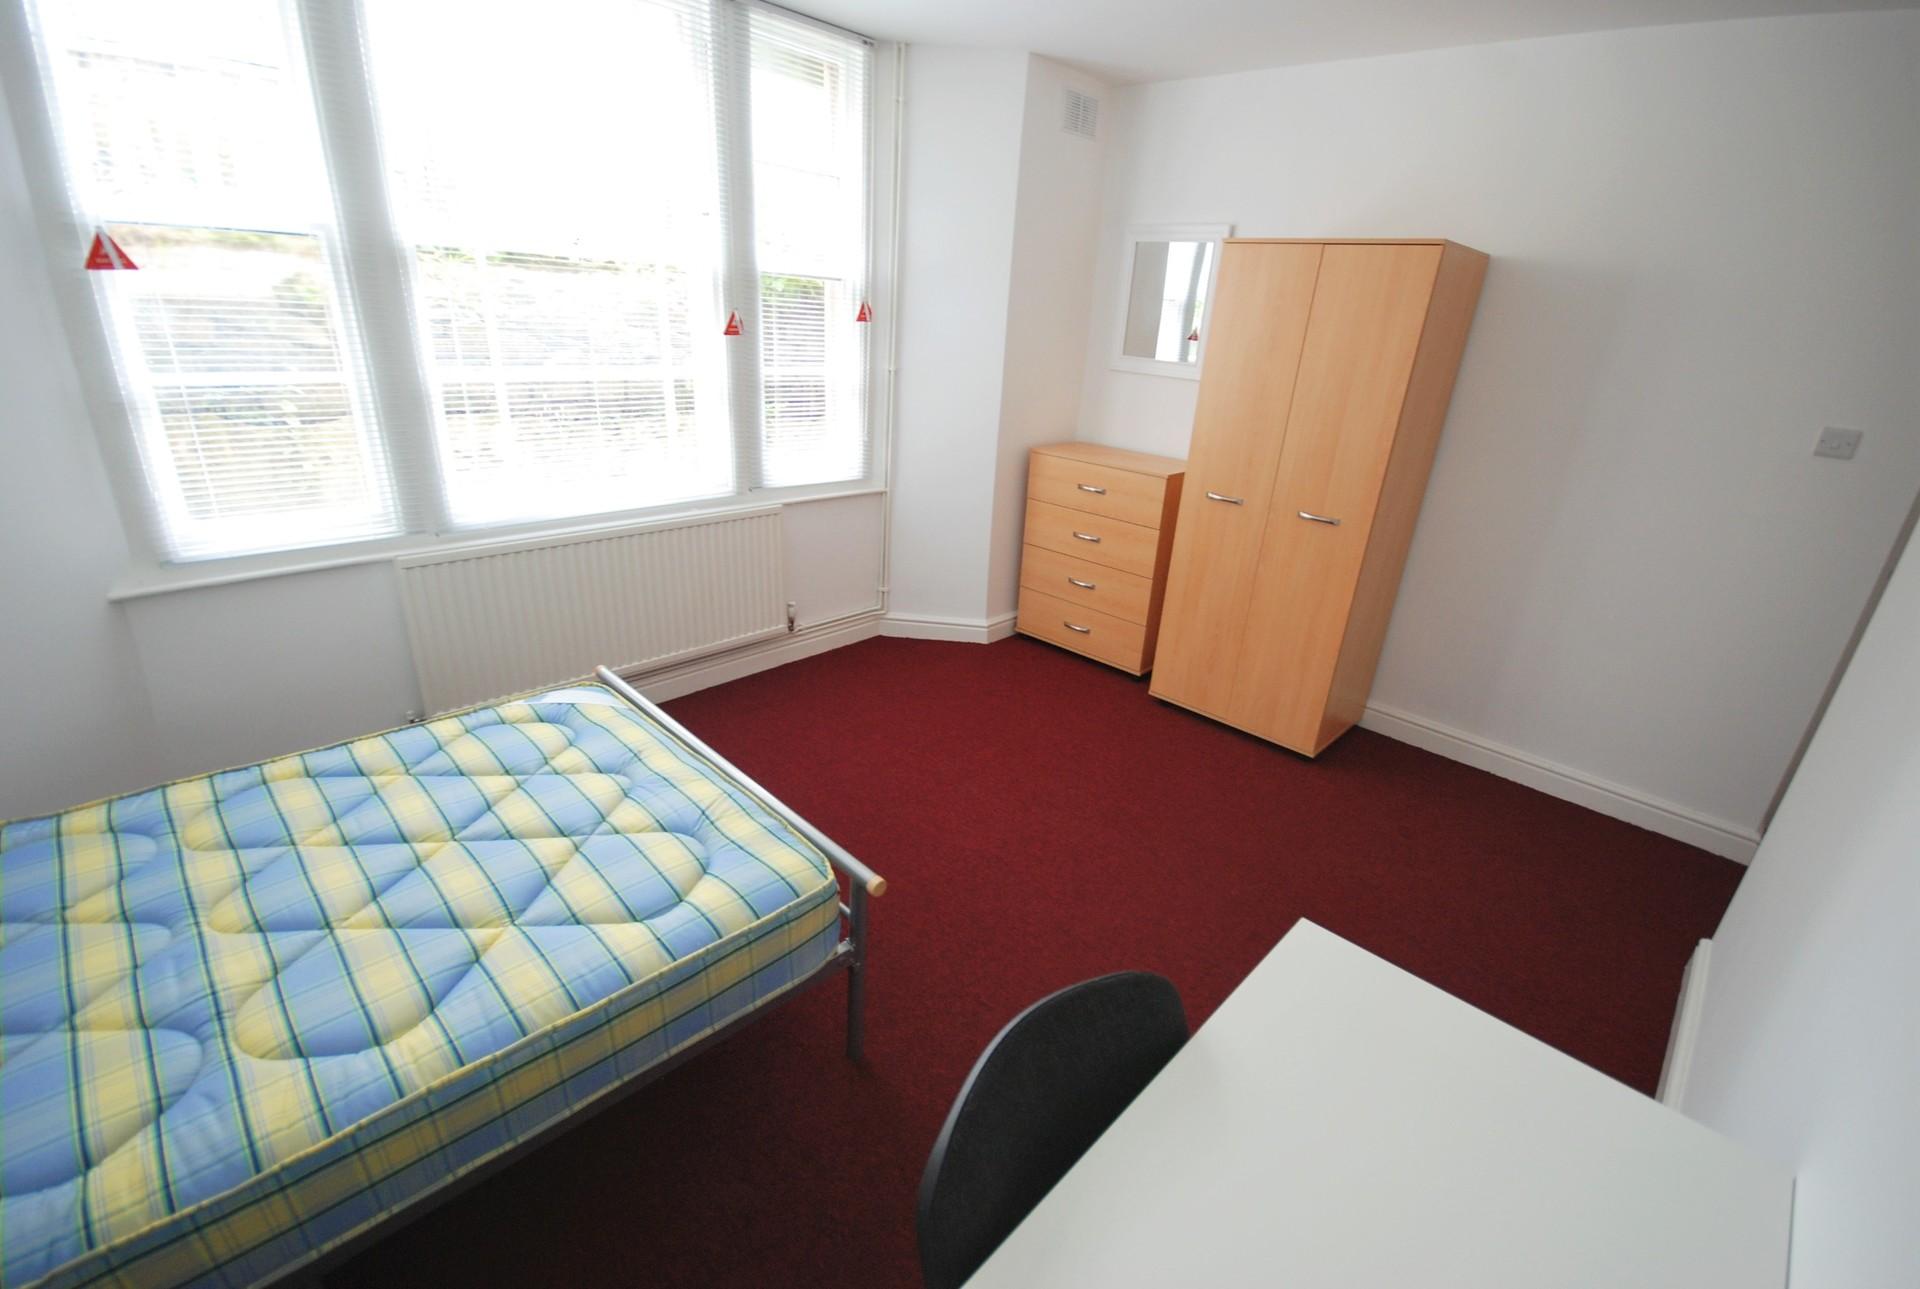 Room For Rent Flat Bristol